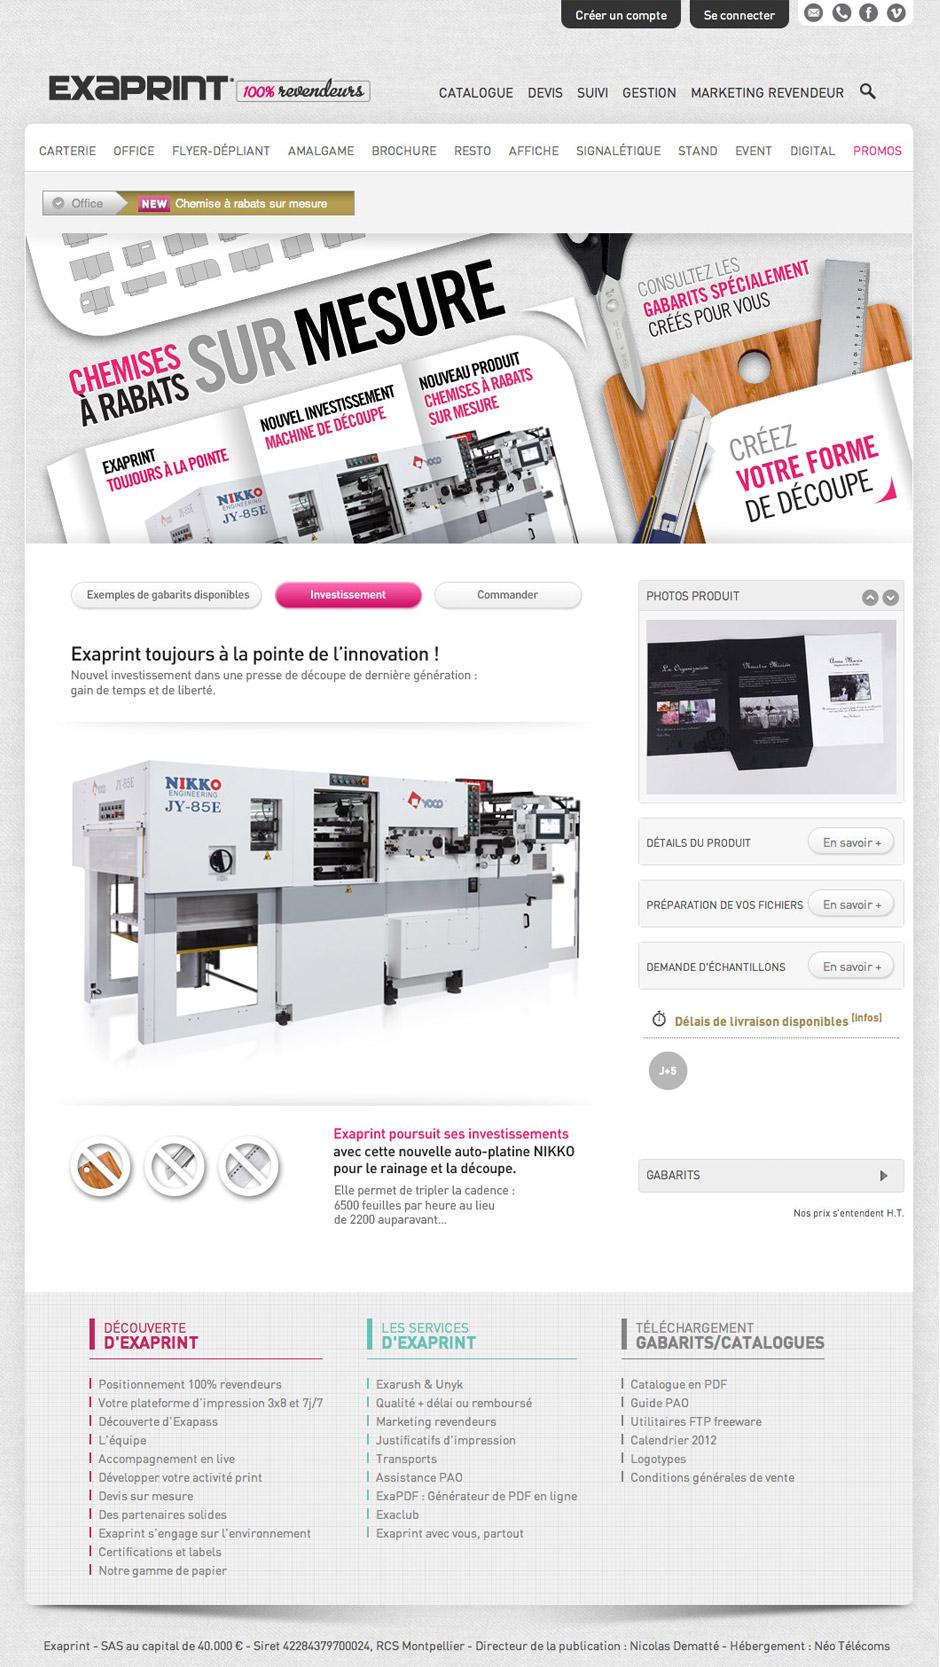 graphiste-montpellier-creation-exaprint-chemise-sur-mesure-agence-communication-montpellier-caconcept-alexis-cretin-3